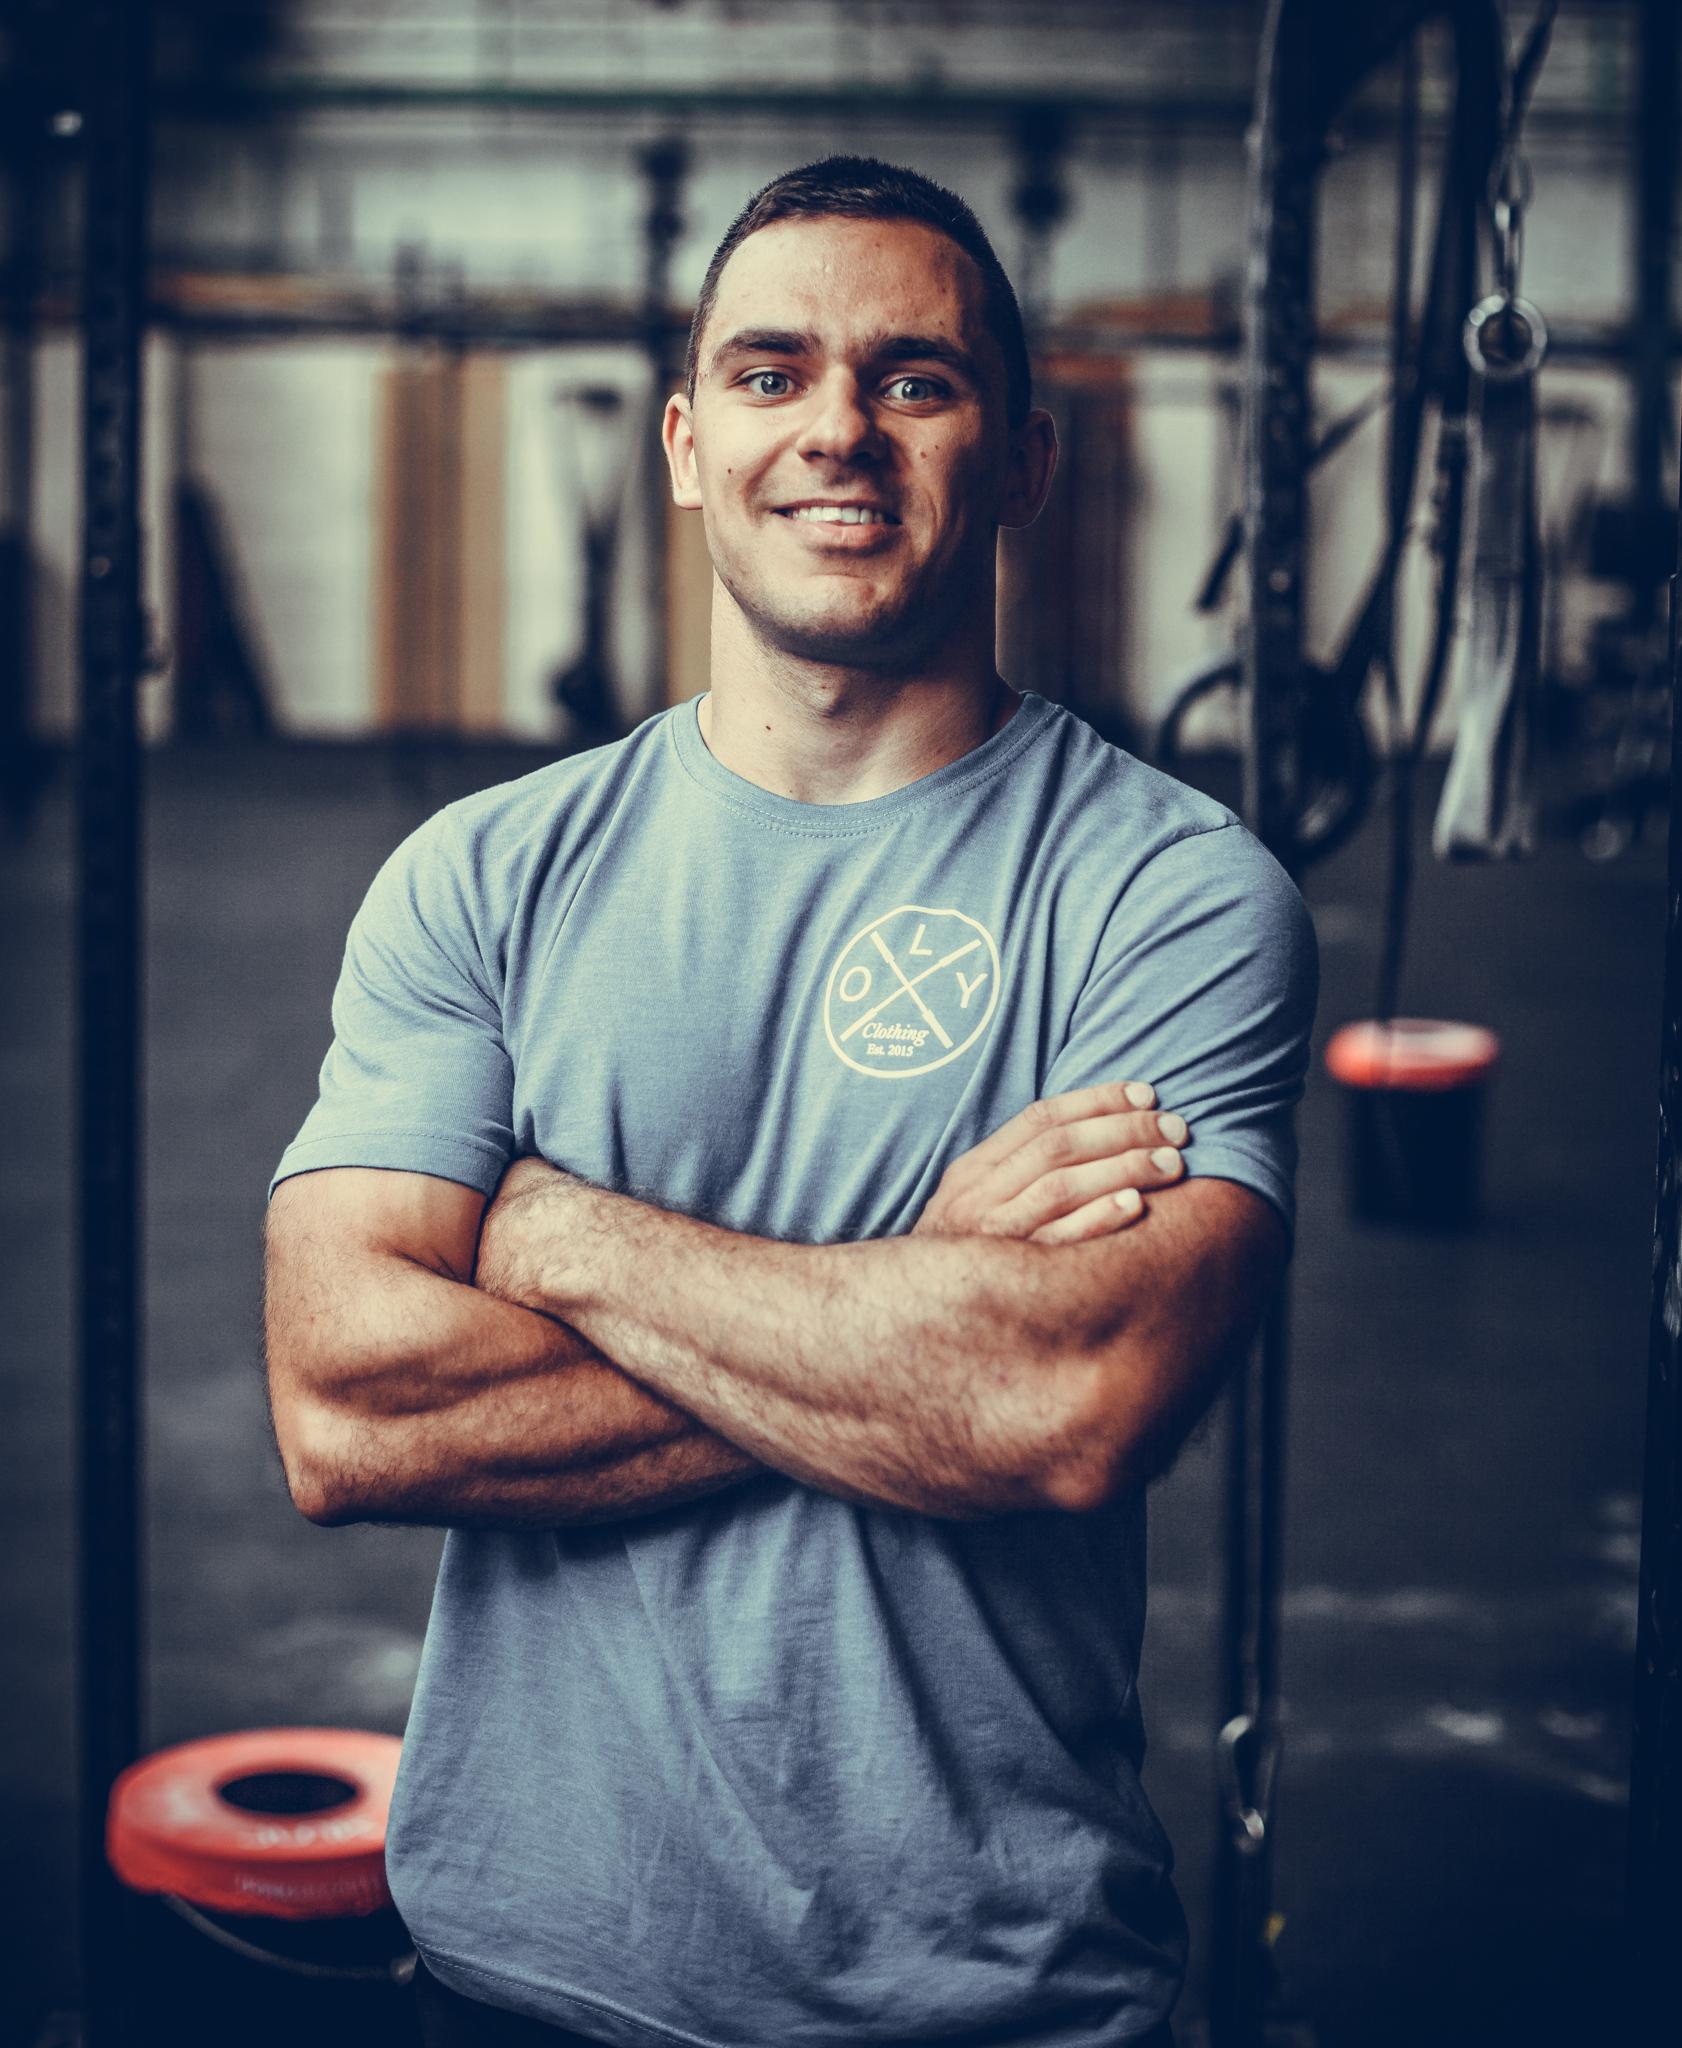 Arminas 'Armi' Balevicius - Competitive Fitness Athlete - 2017 CrossFit Meridian Regionals (17th Place)2018 CrossFit Central Europe Regionals (34th Place)2018 Spanish Throwdown Winner